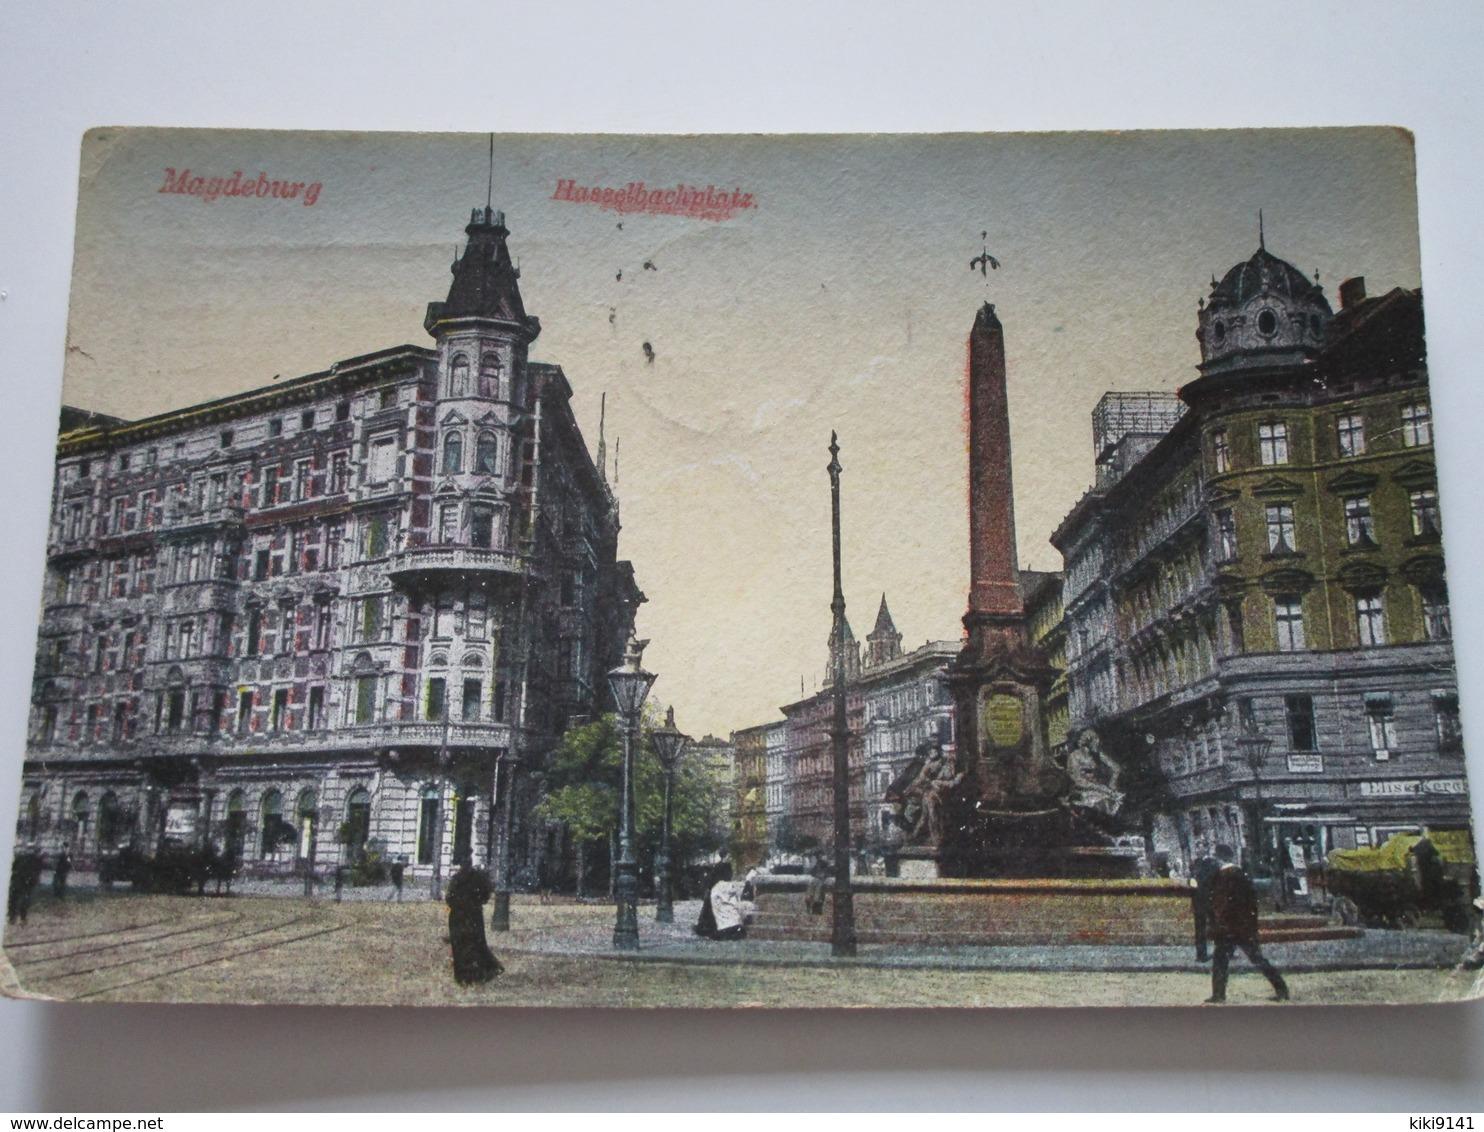 Hasselbachplatz - Magdeburg